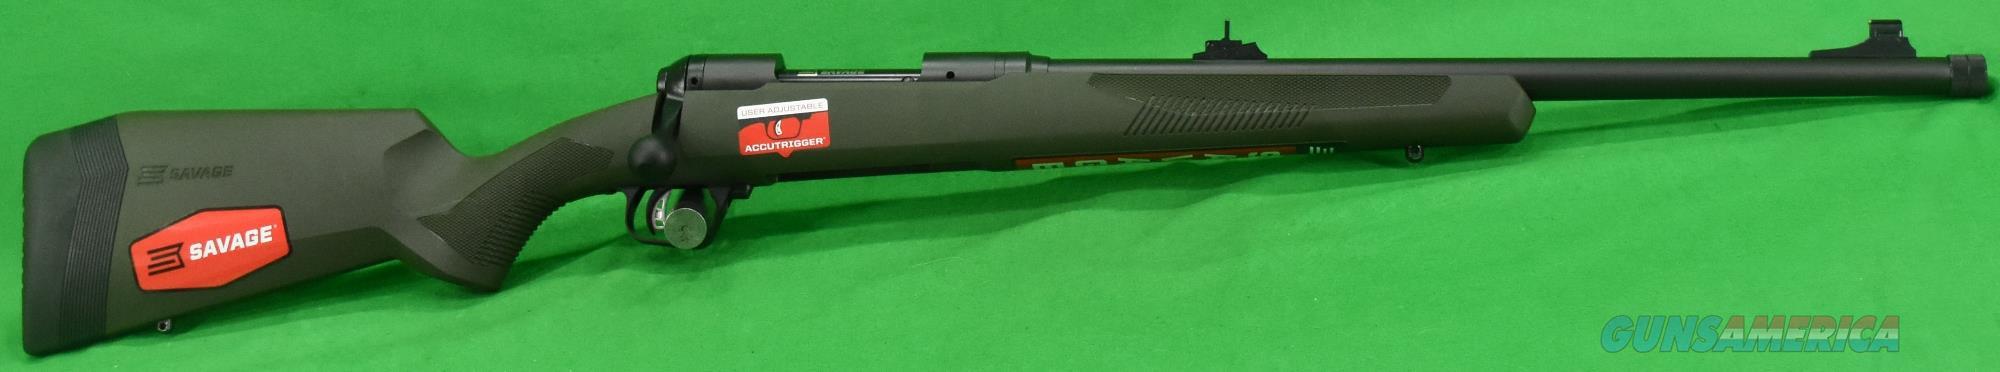 110 Hog Hunter OD Green 308Win 20In  57019  Guns > Rifles > Savage Rifles > 10/110